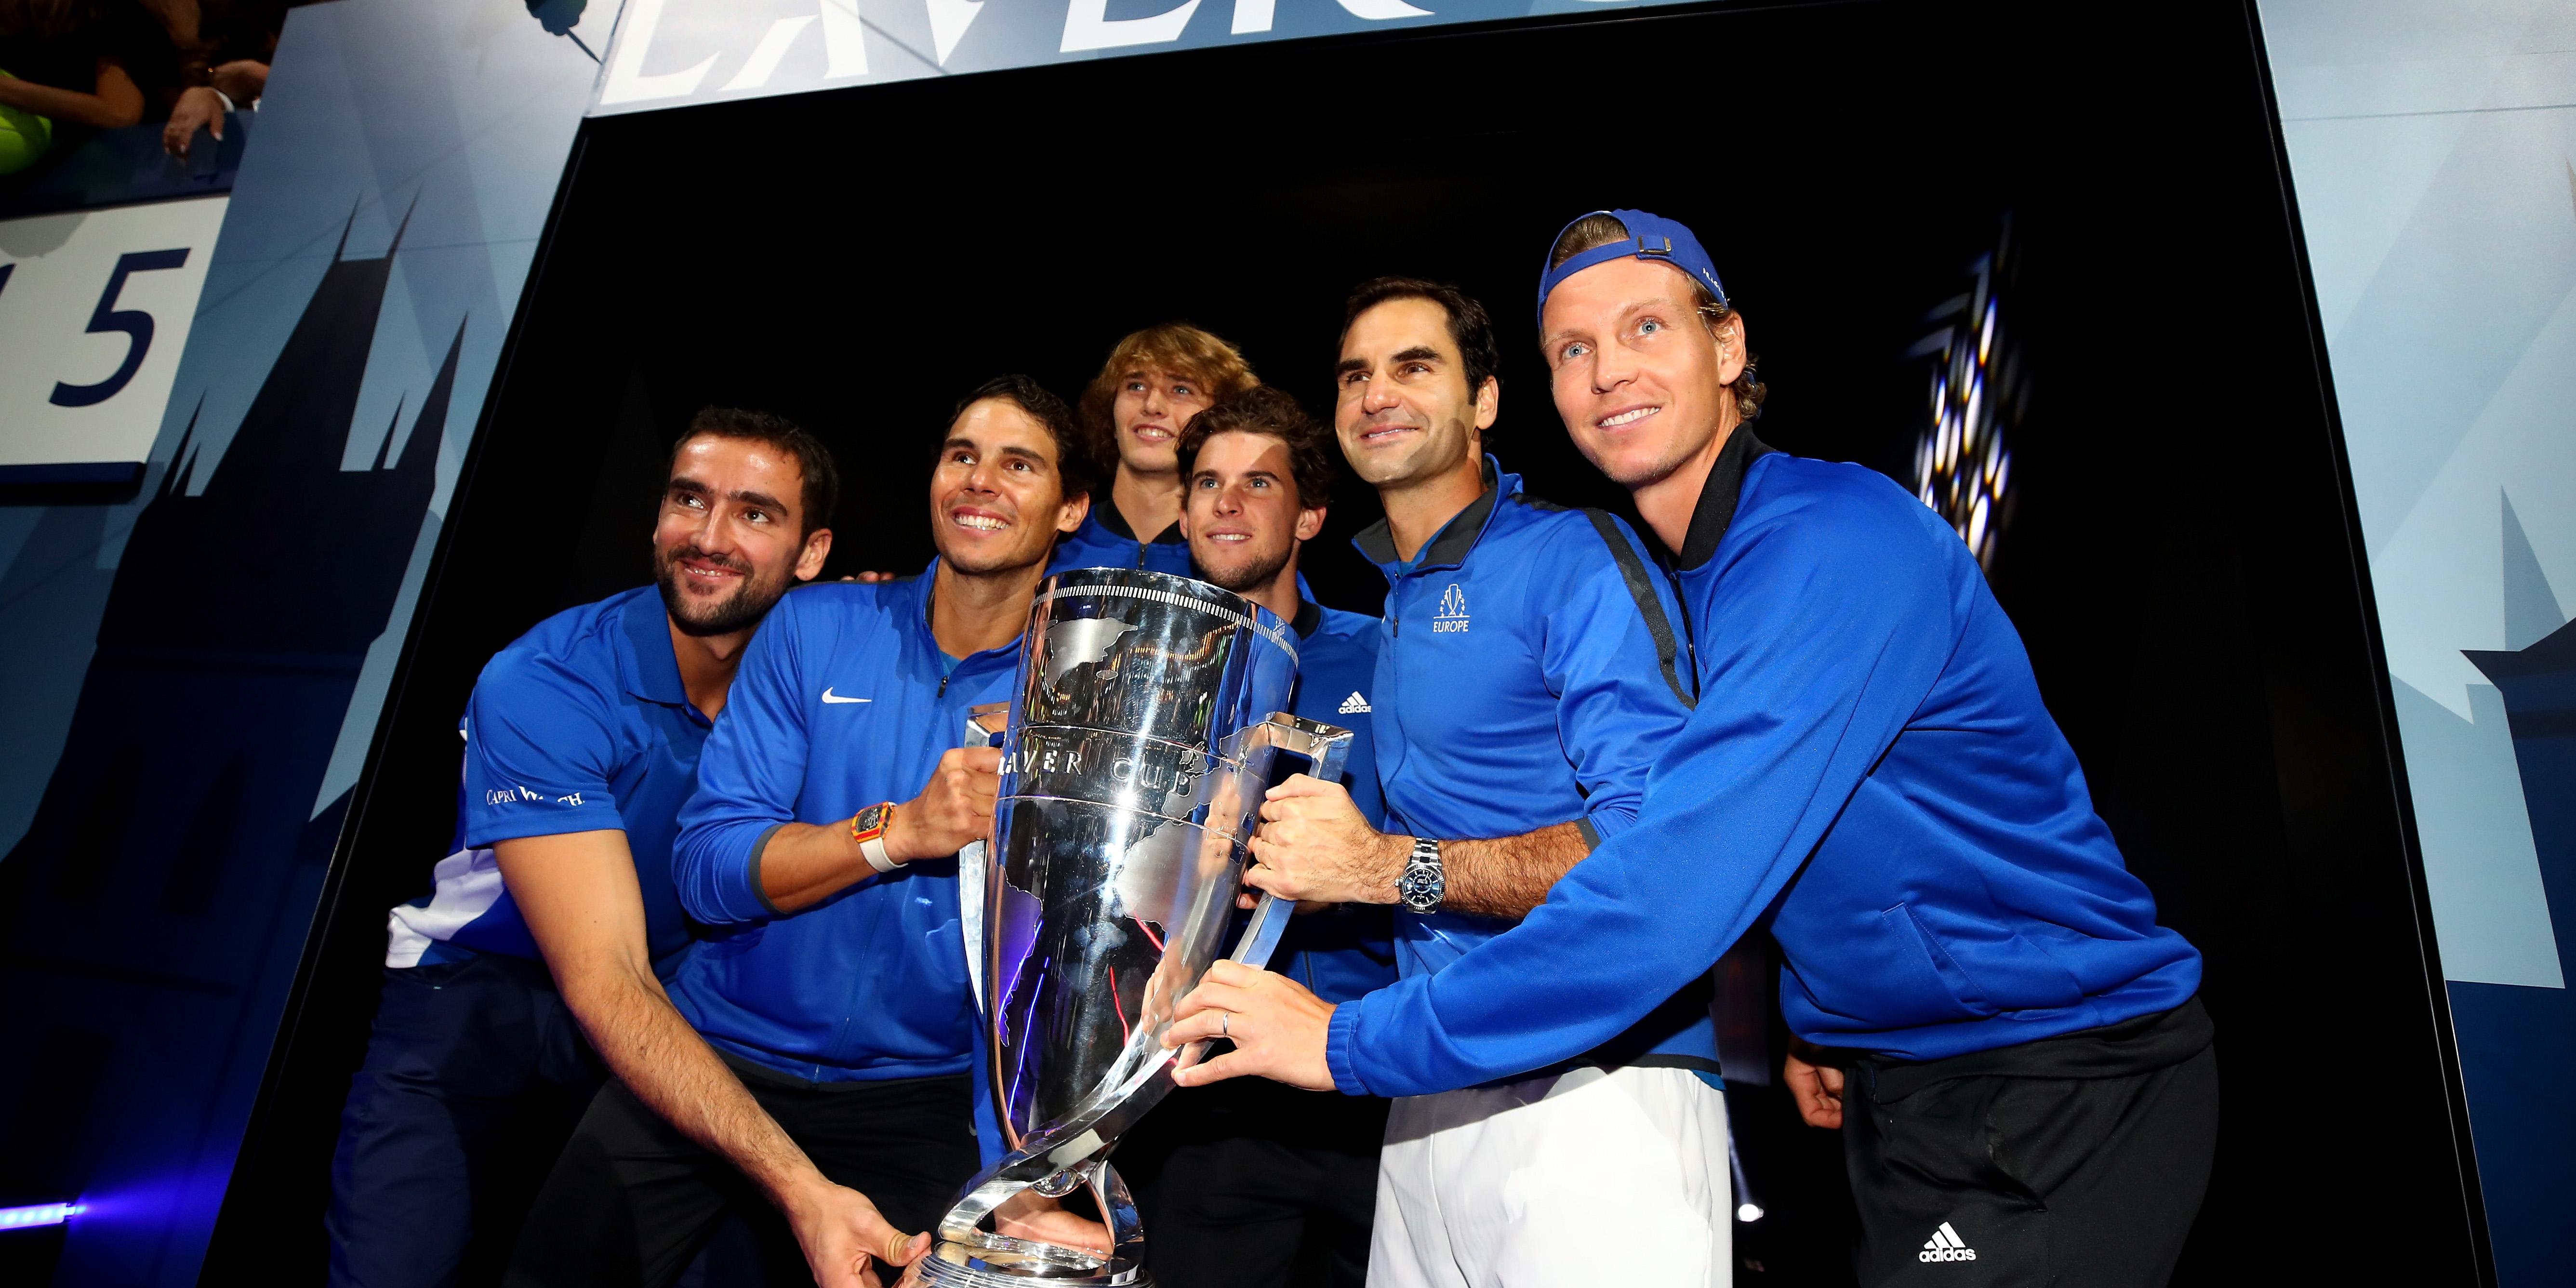 Team Europa, Laver Cup 2017